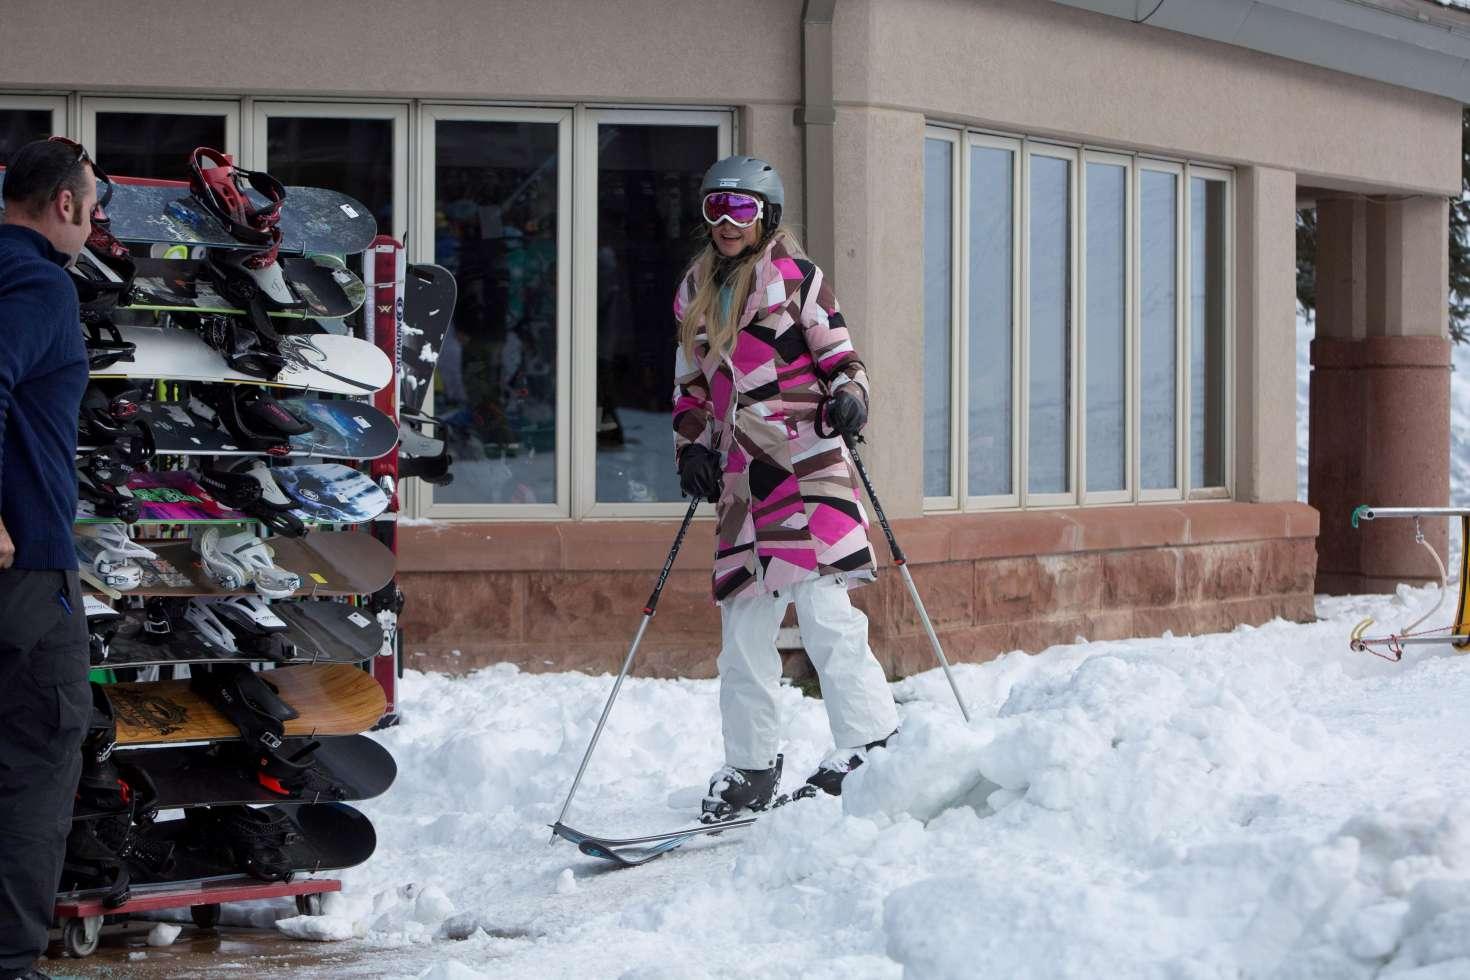 Paris Hilton 2016 : Paris Hilton Skiing in Aspen -33